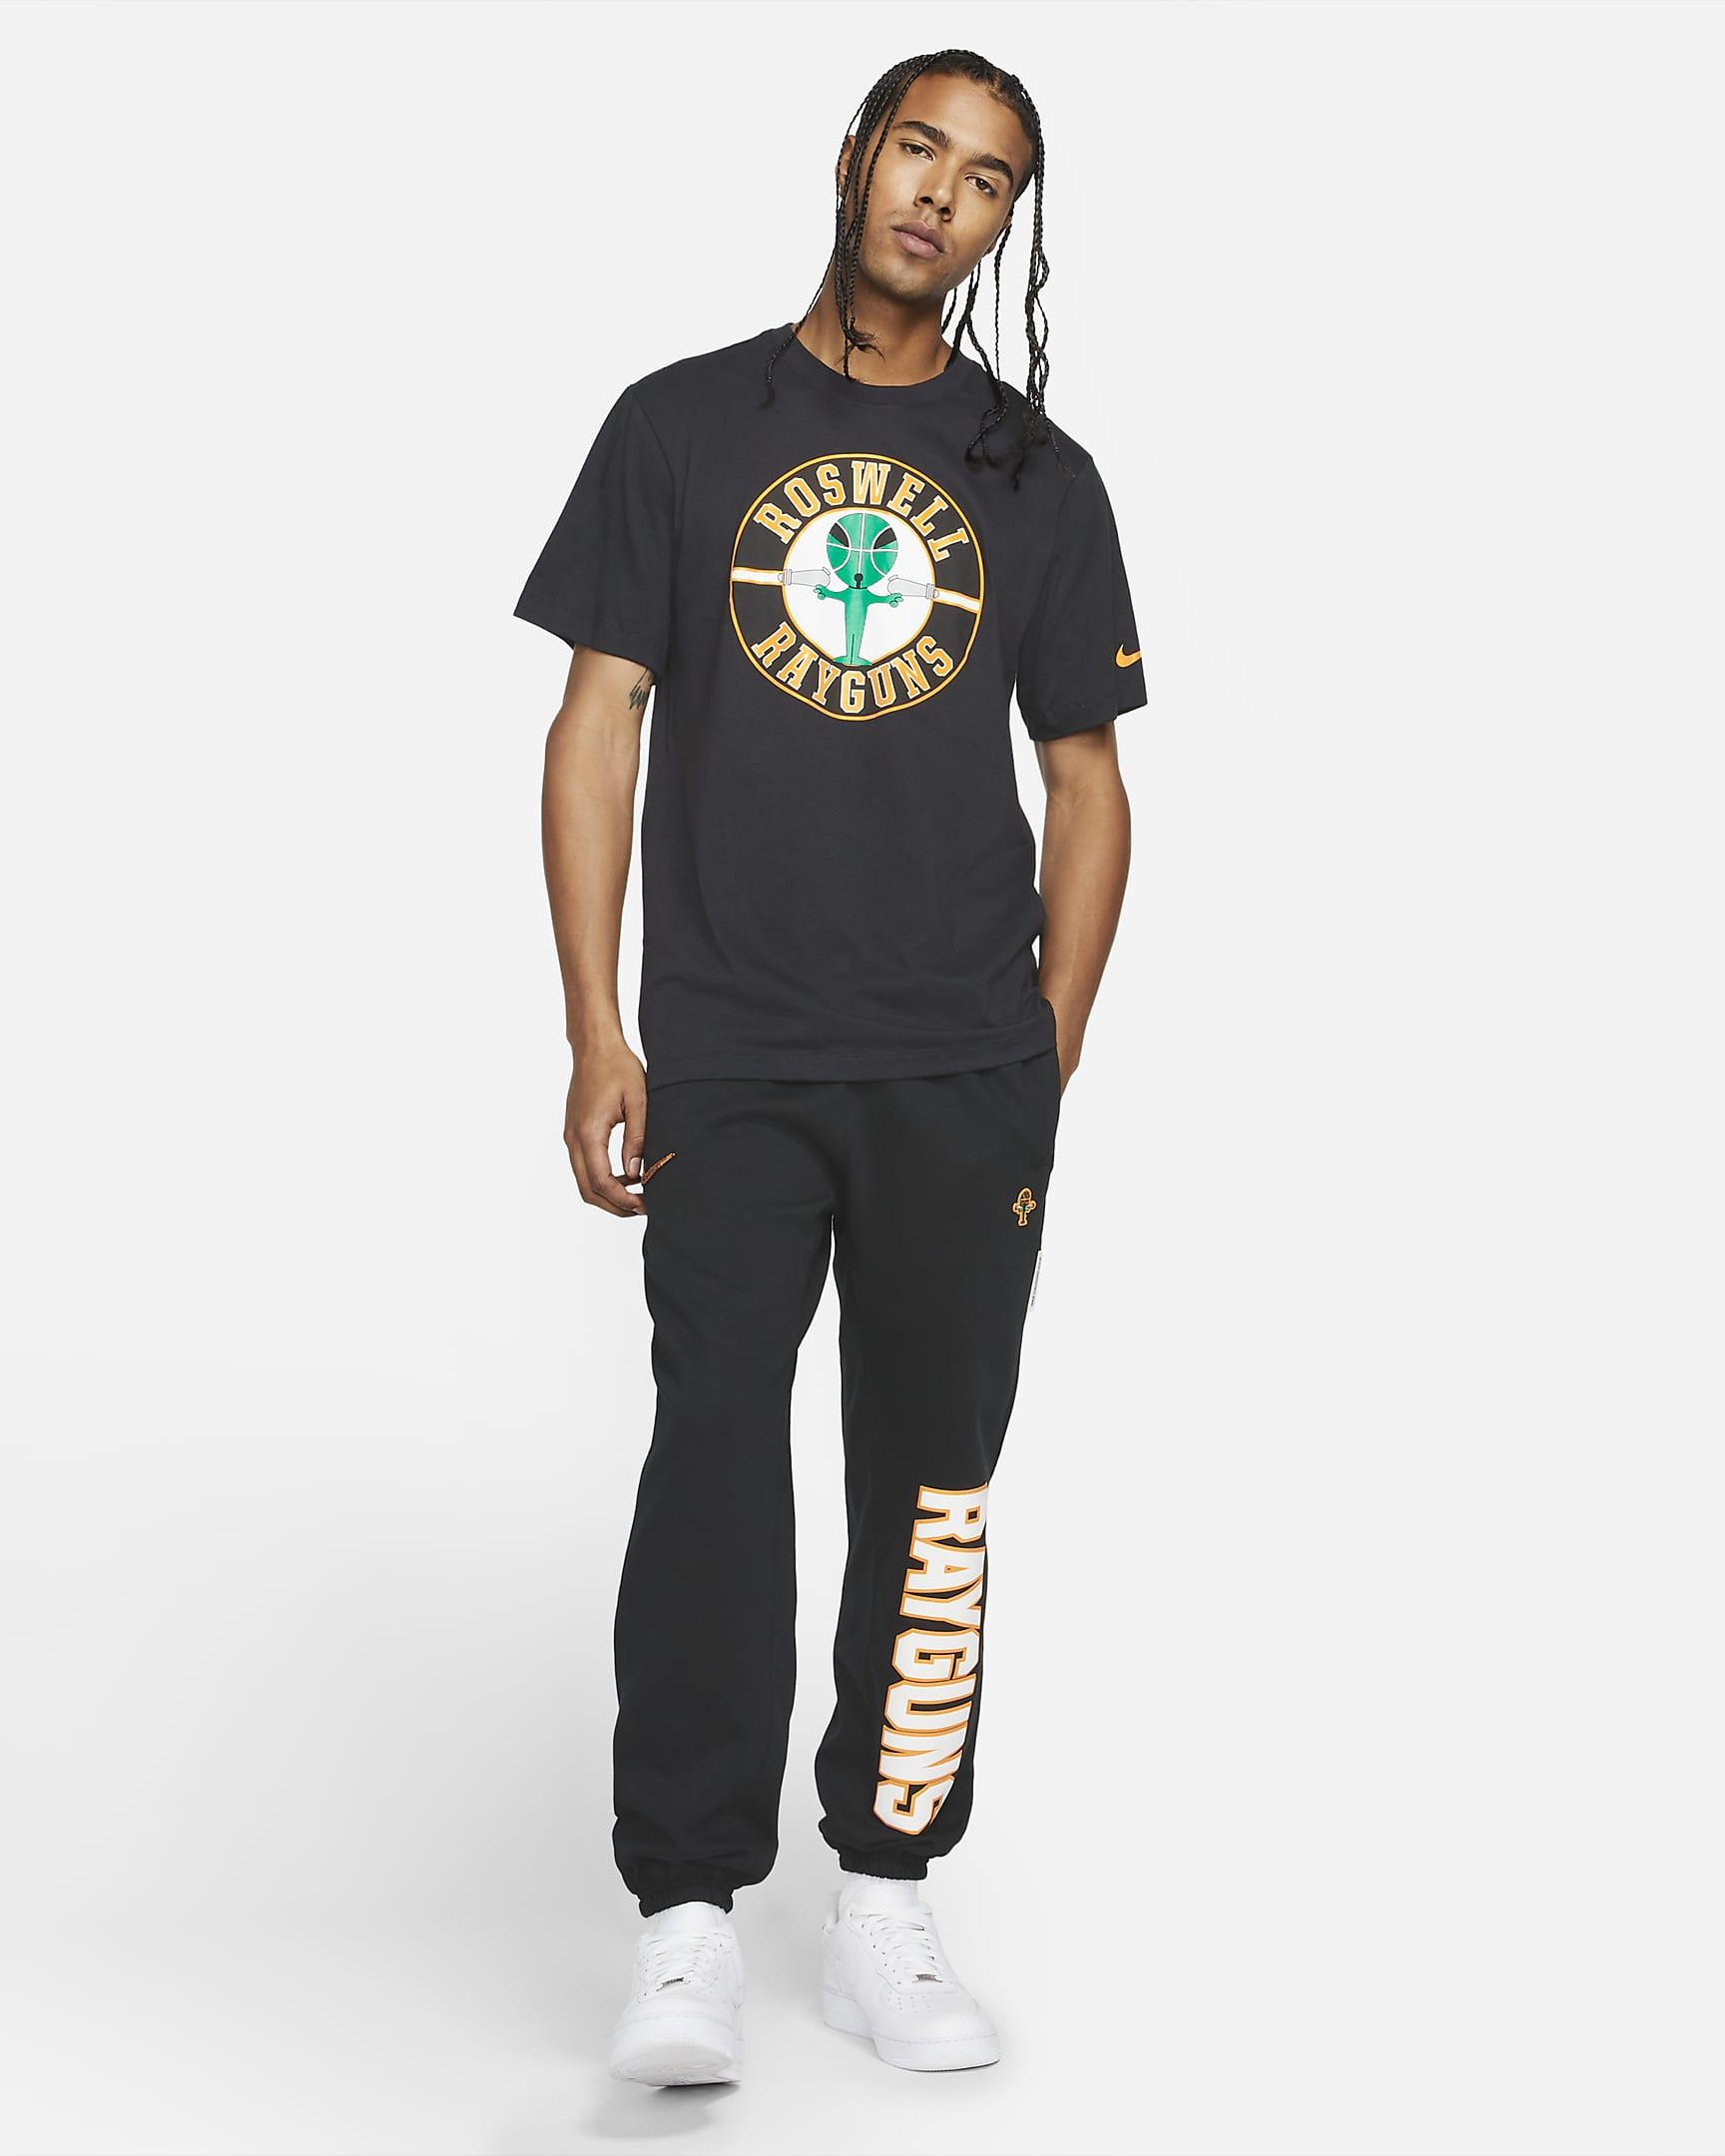 rayguns-mens-basketball-t-shirt-kgKBwR-8